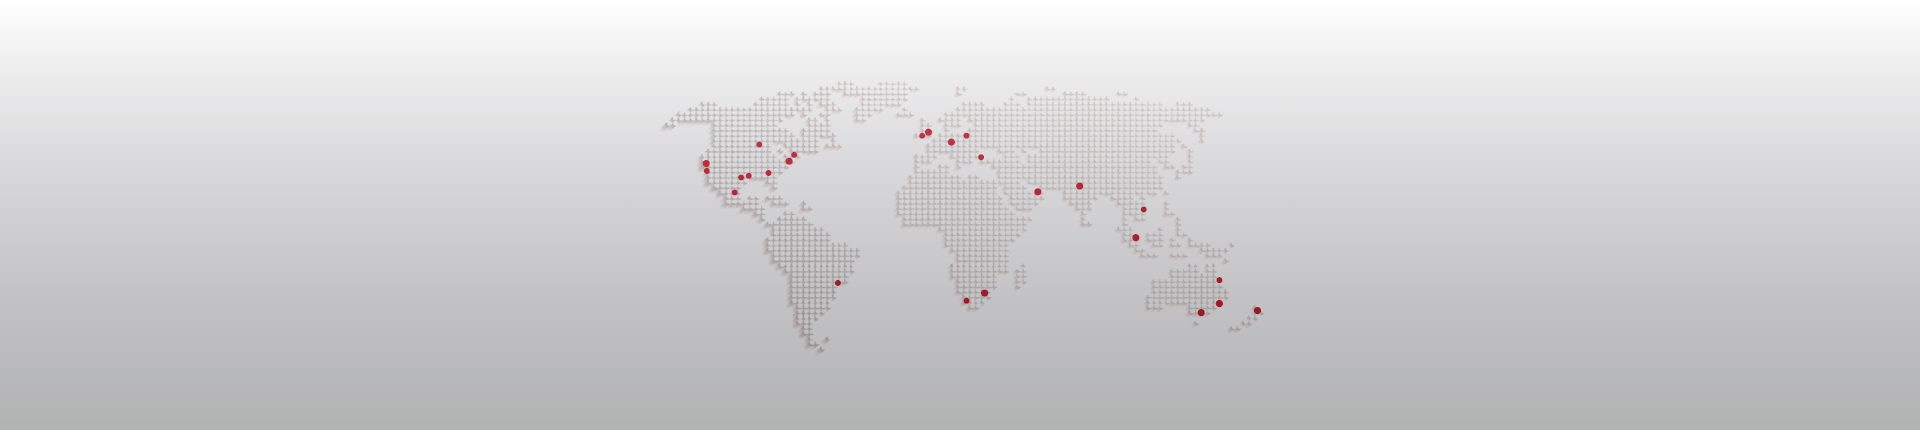 World map4